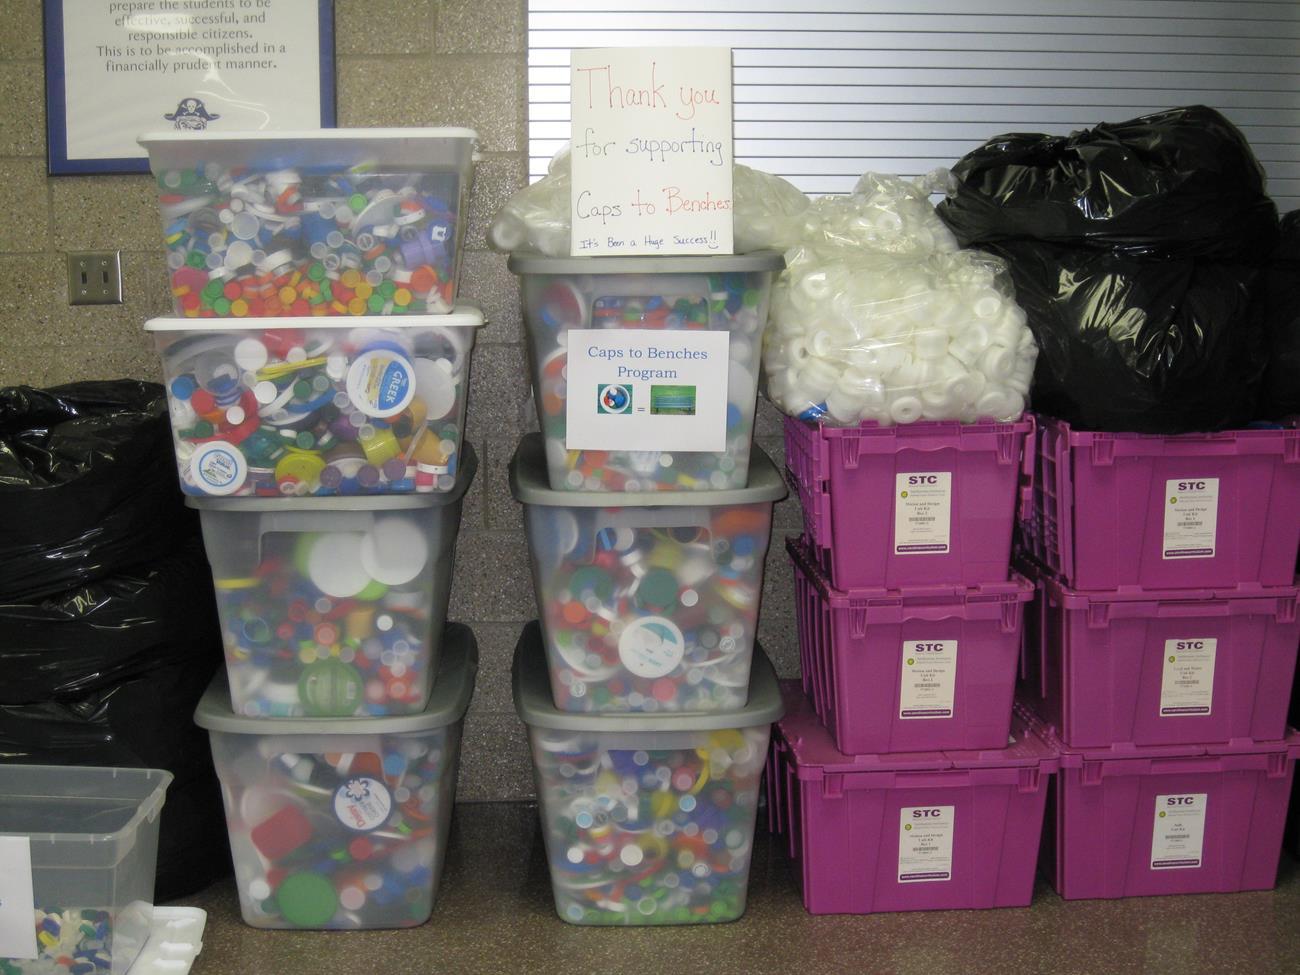 Bins and bins of plastic caps